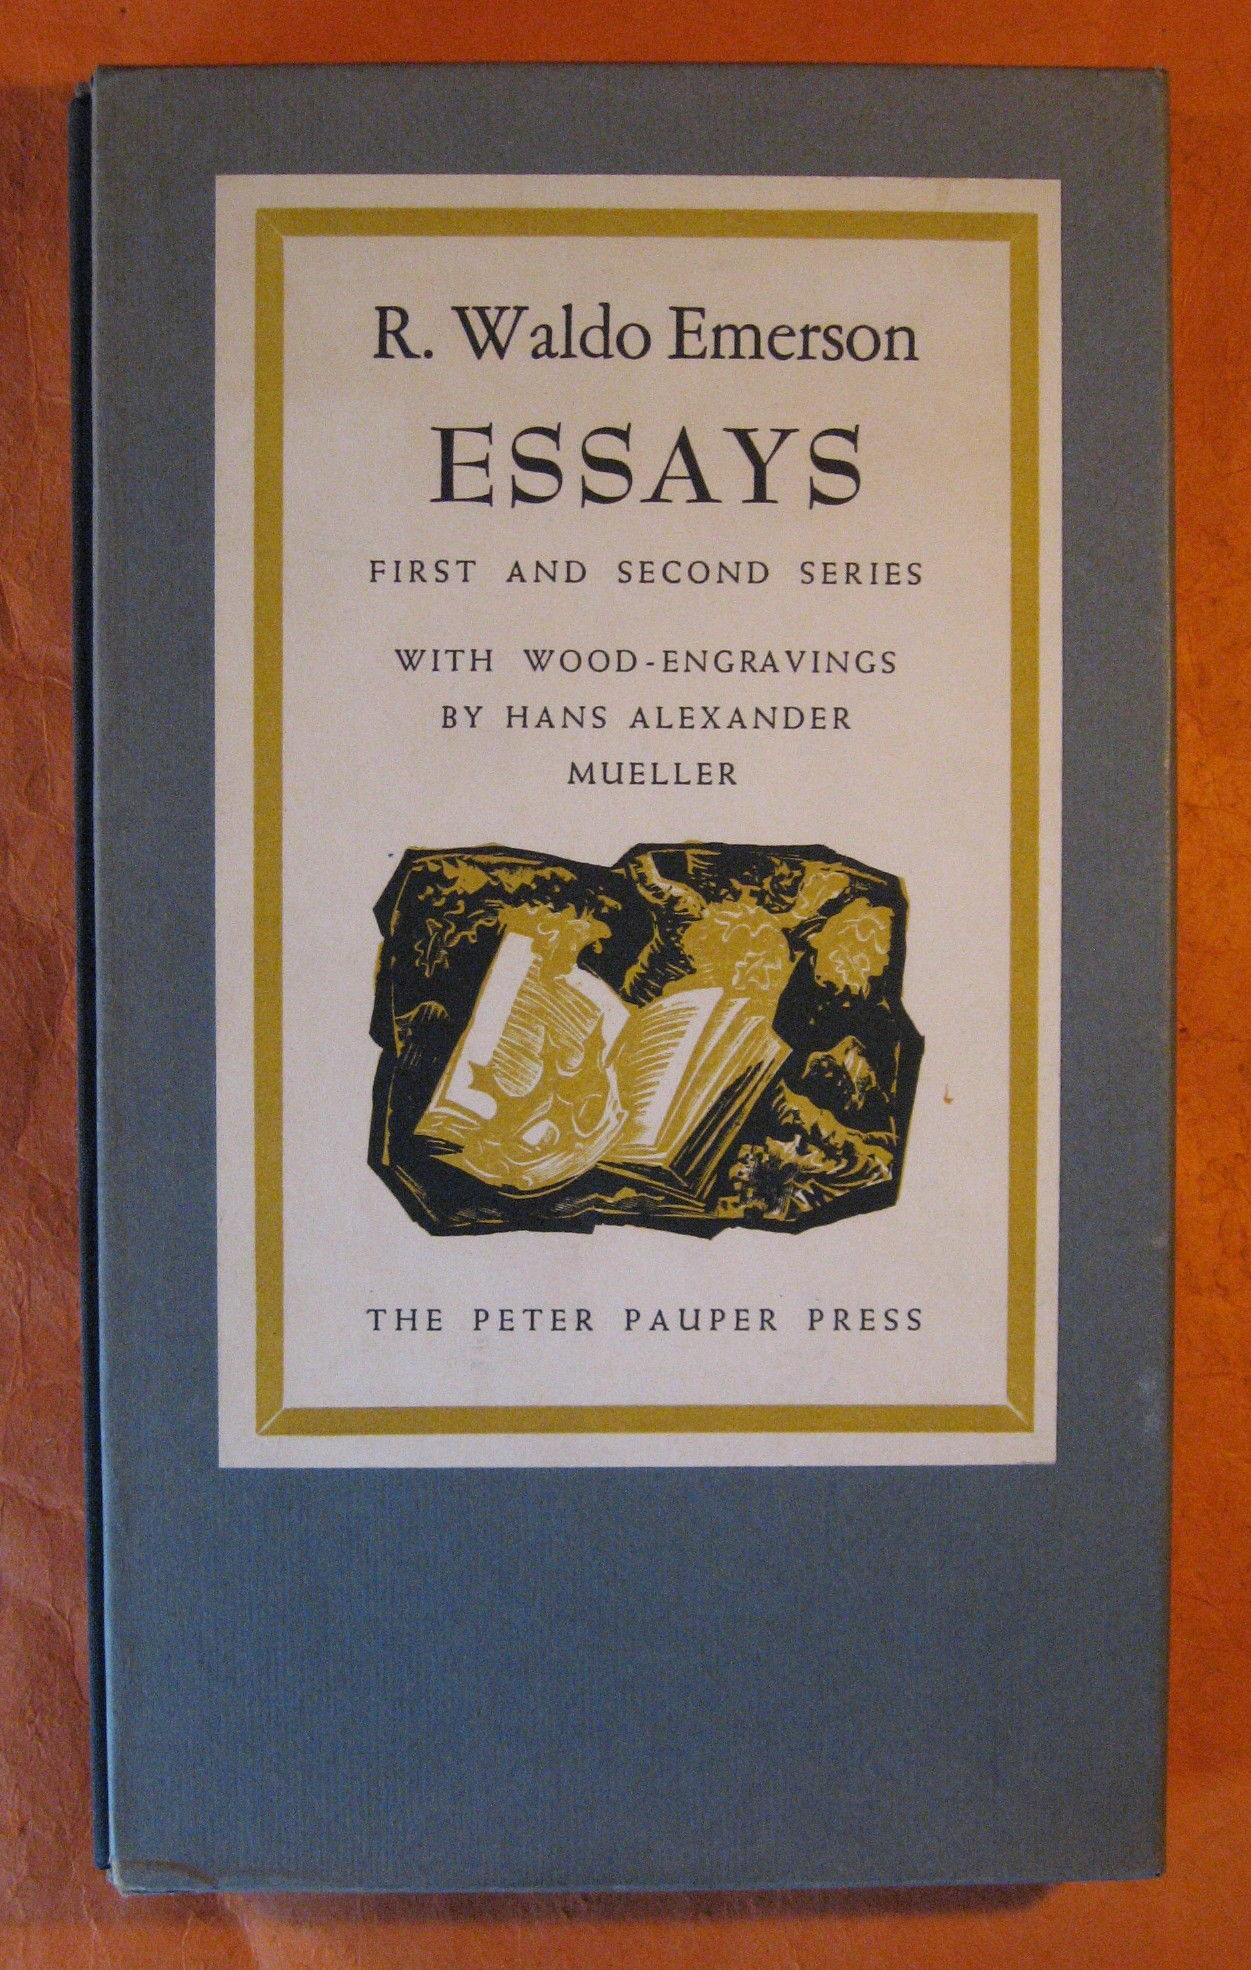 012 Essays First Series X Essay Stunning Emerson Pdf Shelburne Publisher Full